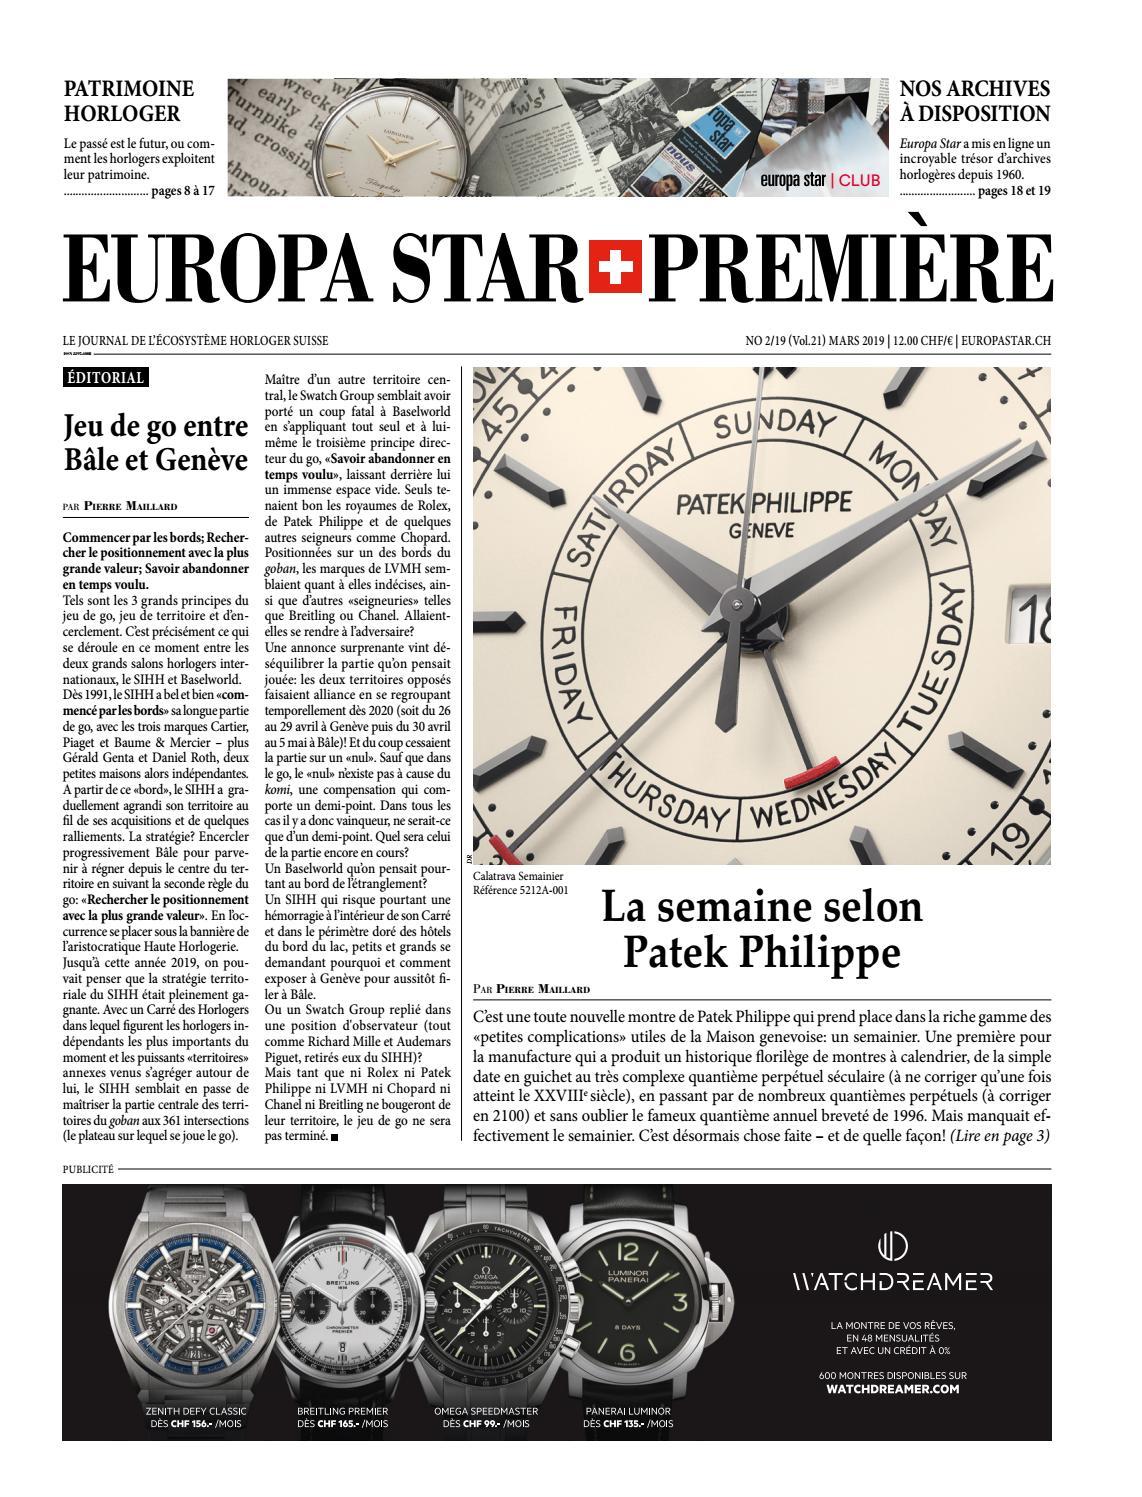 Europa Star Premiere 2 19 By Europa Star Hbm Issuu